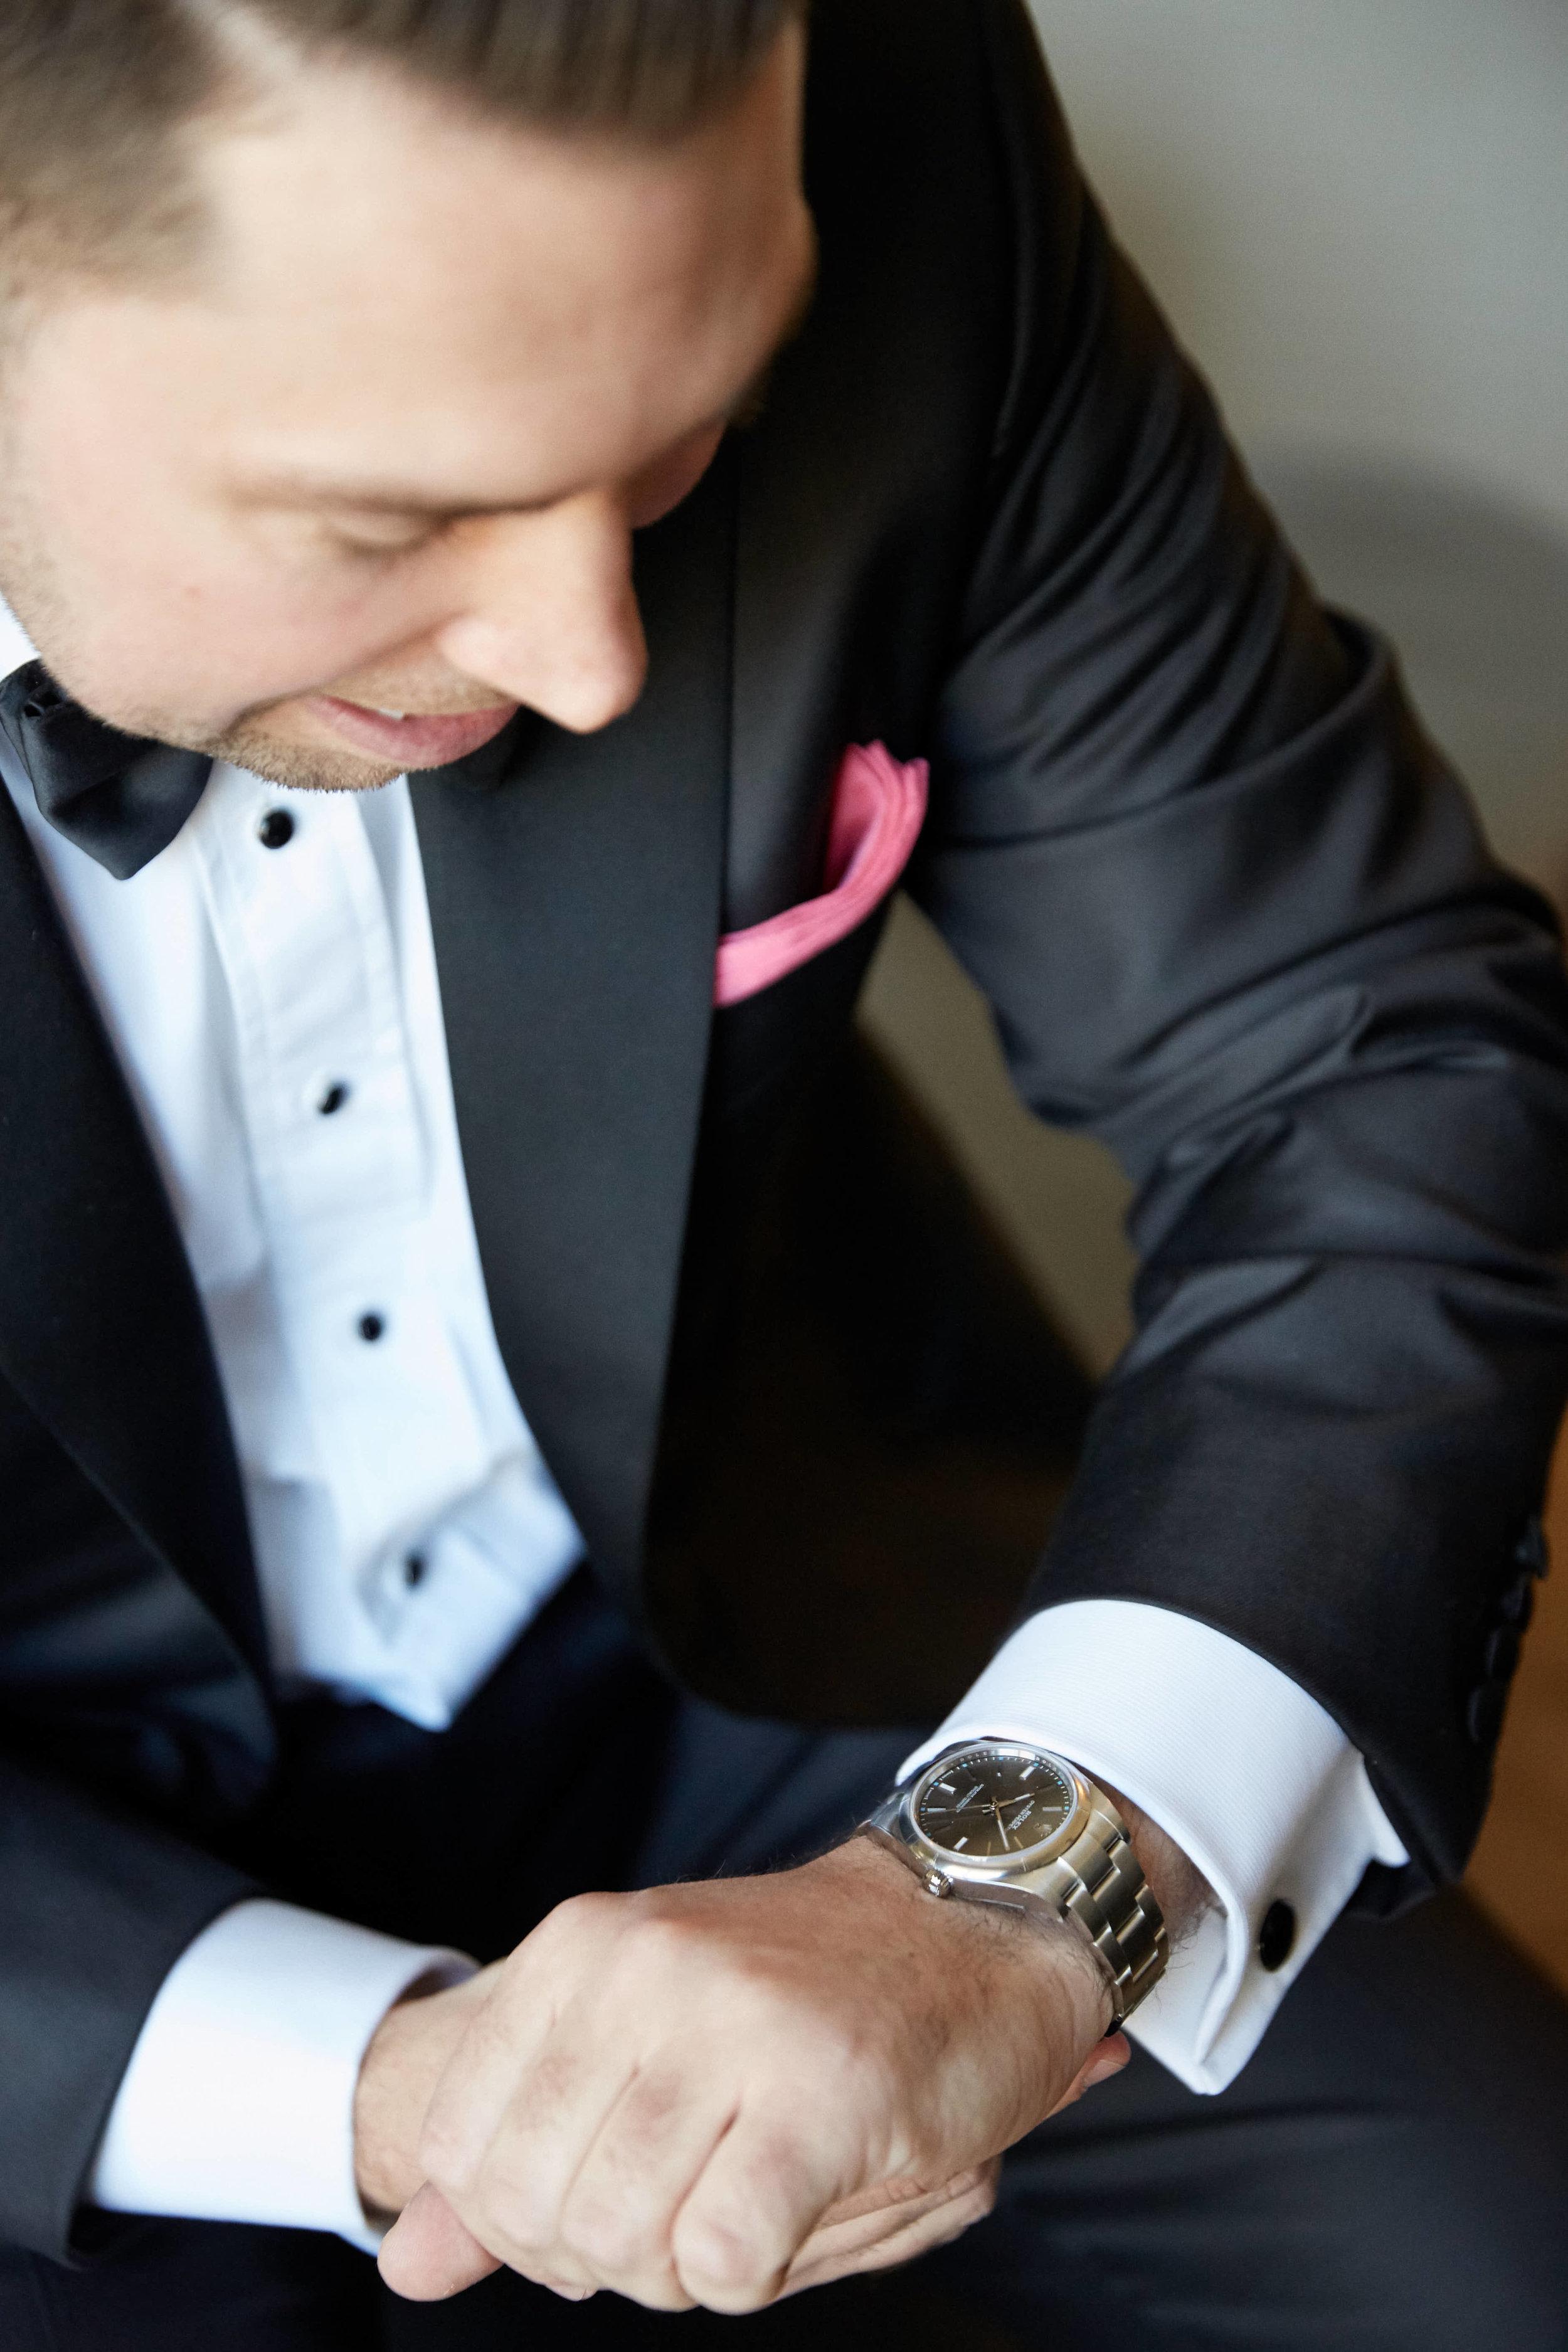 grooms-pink-pocket-square-wedding-nyc-ct